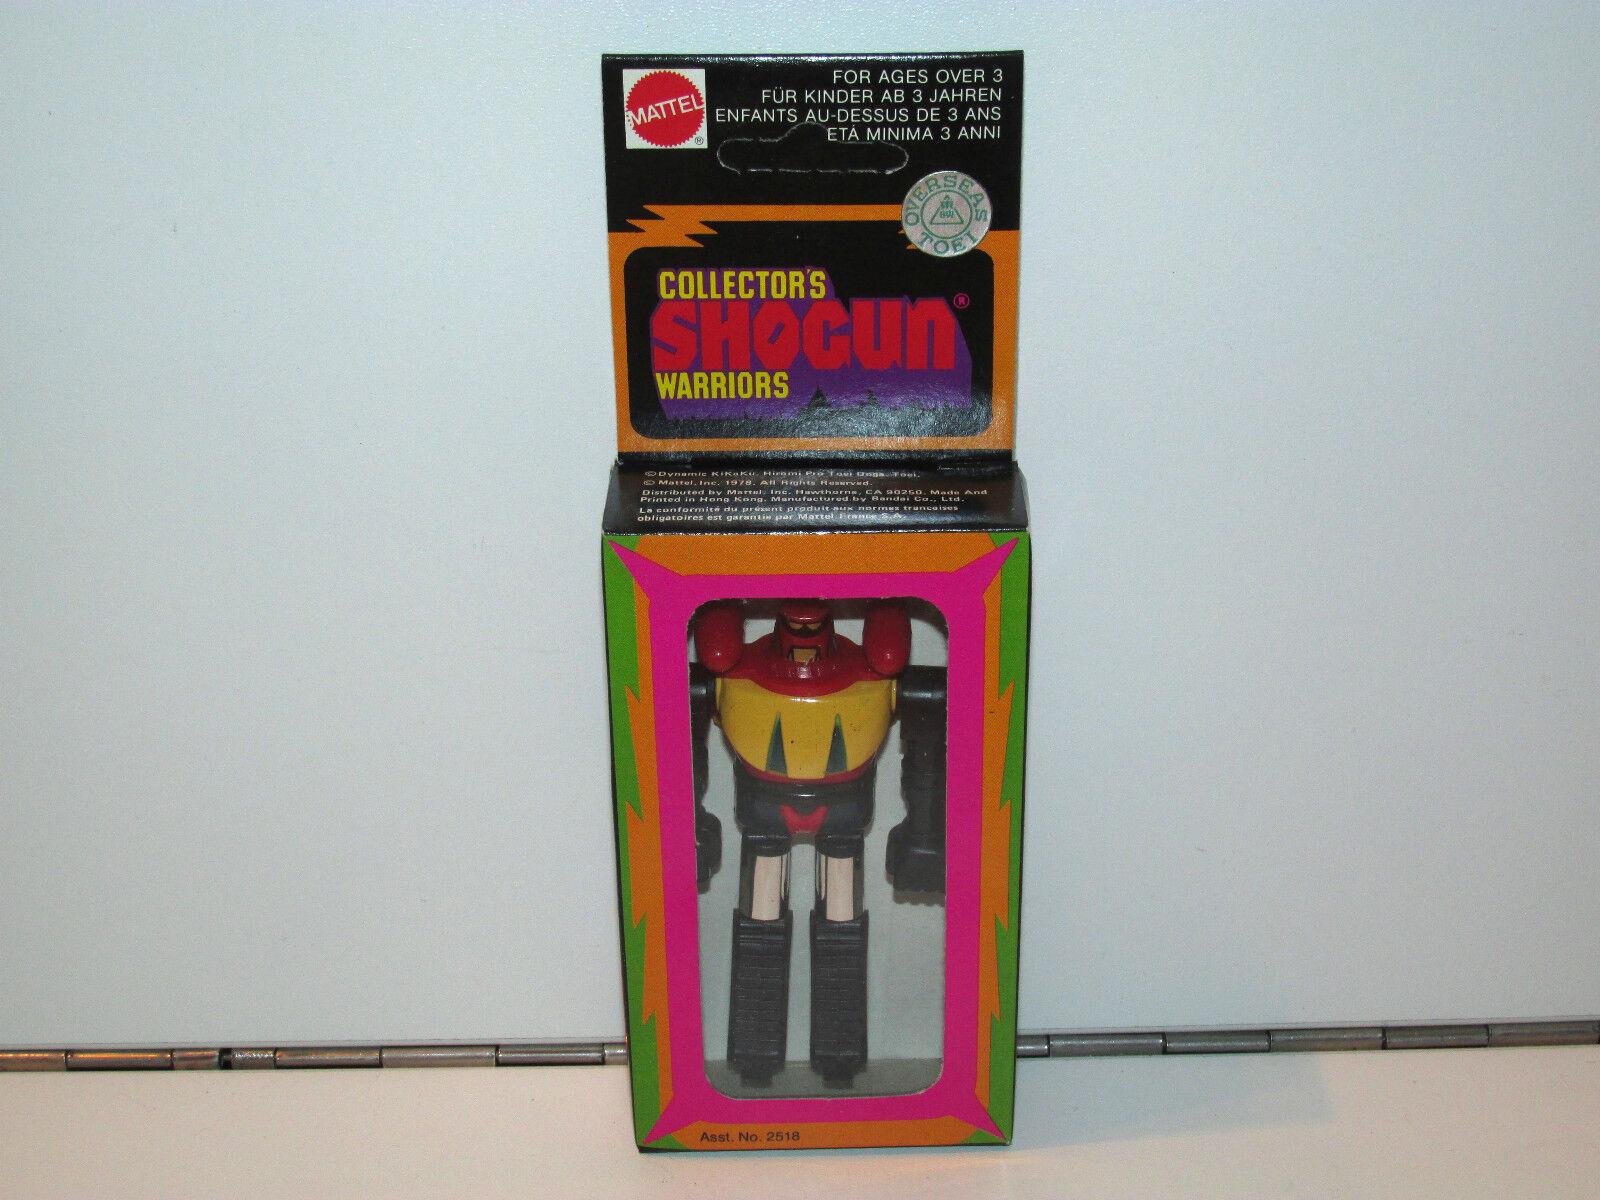 SHOGUN WARRIORS COLLECTOR'S SERIES 3  POSEIDON MIB NRFB CASEFRESH 1970s MATTEL